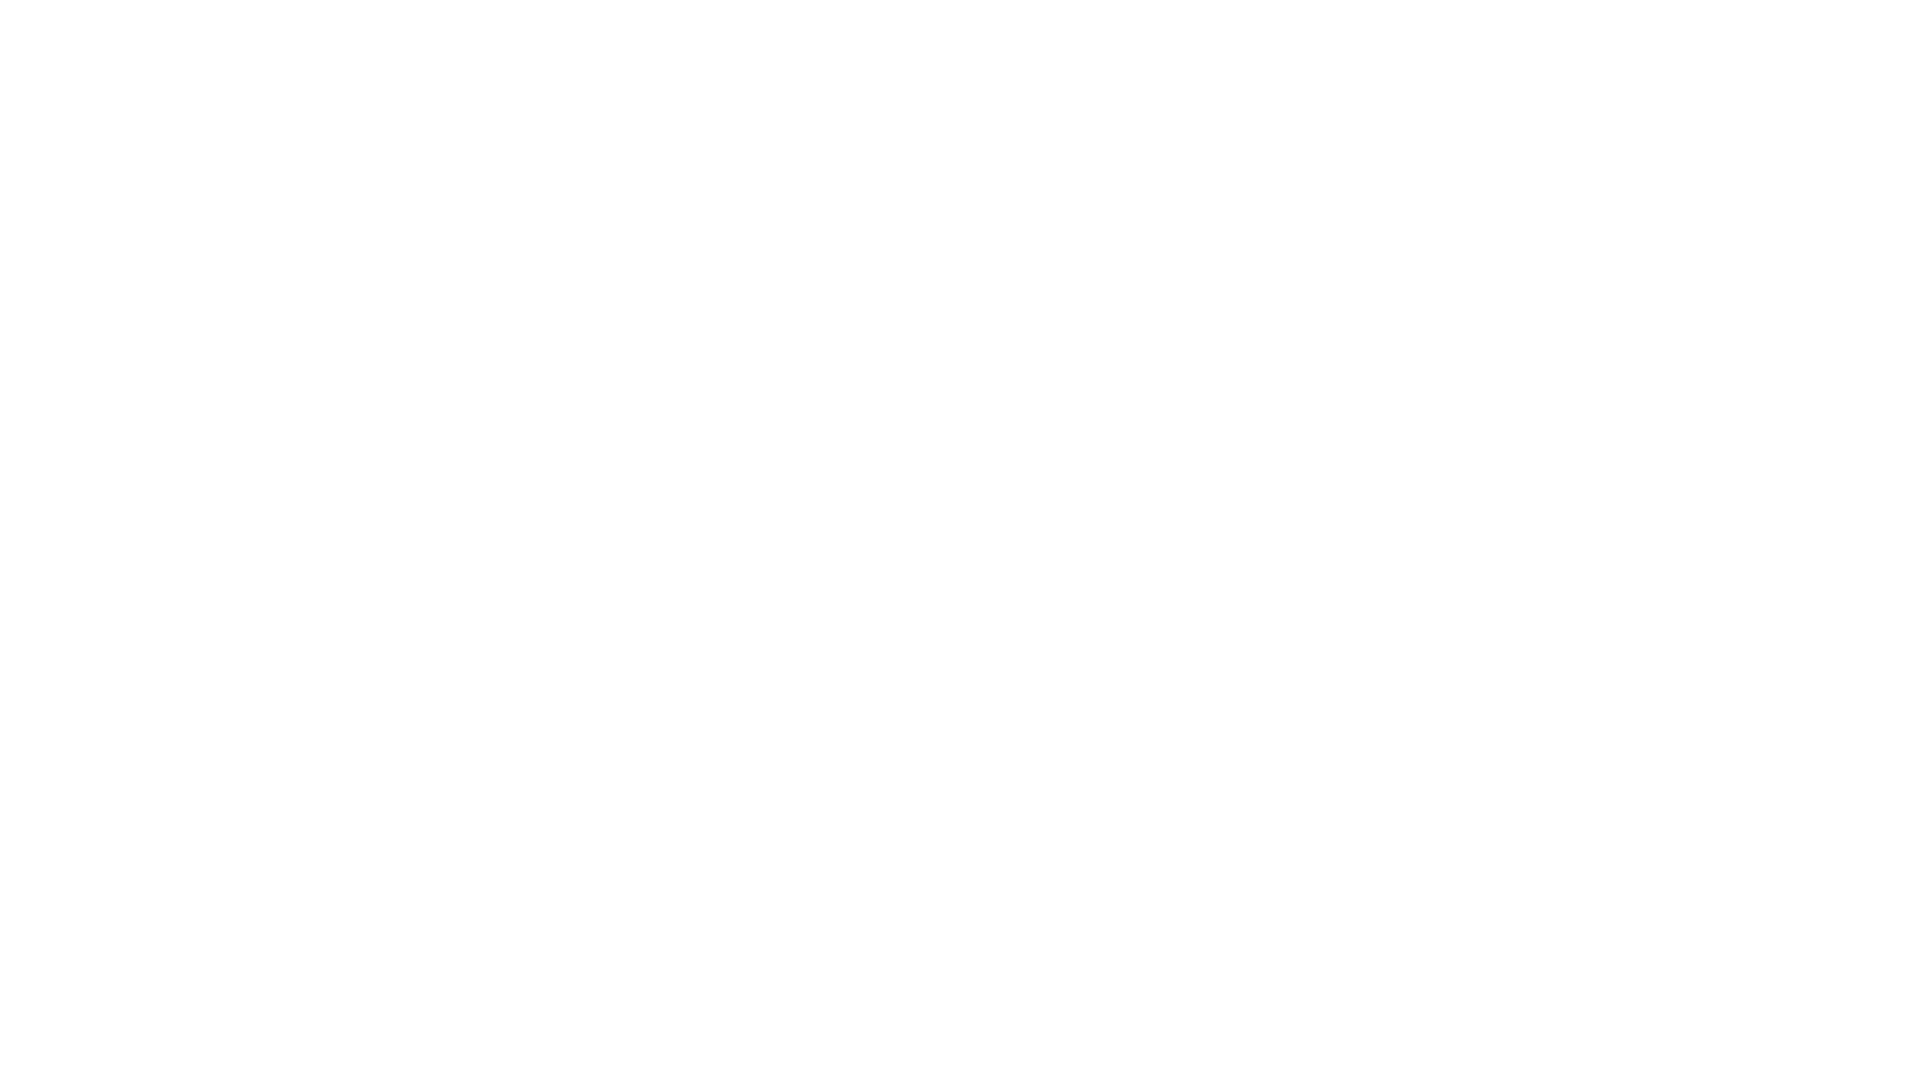 Transparant-01